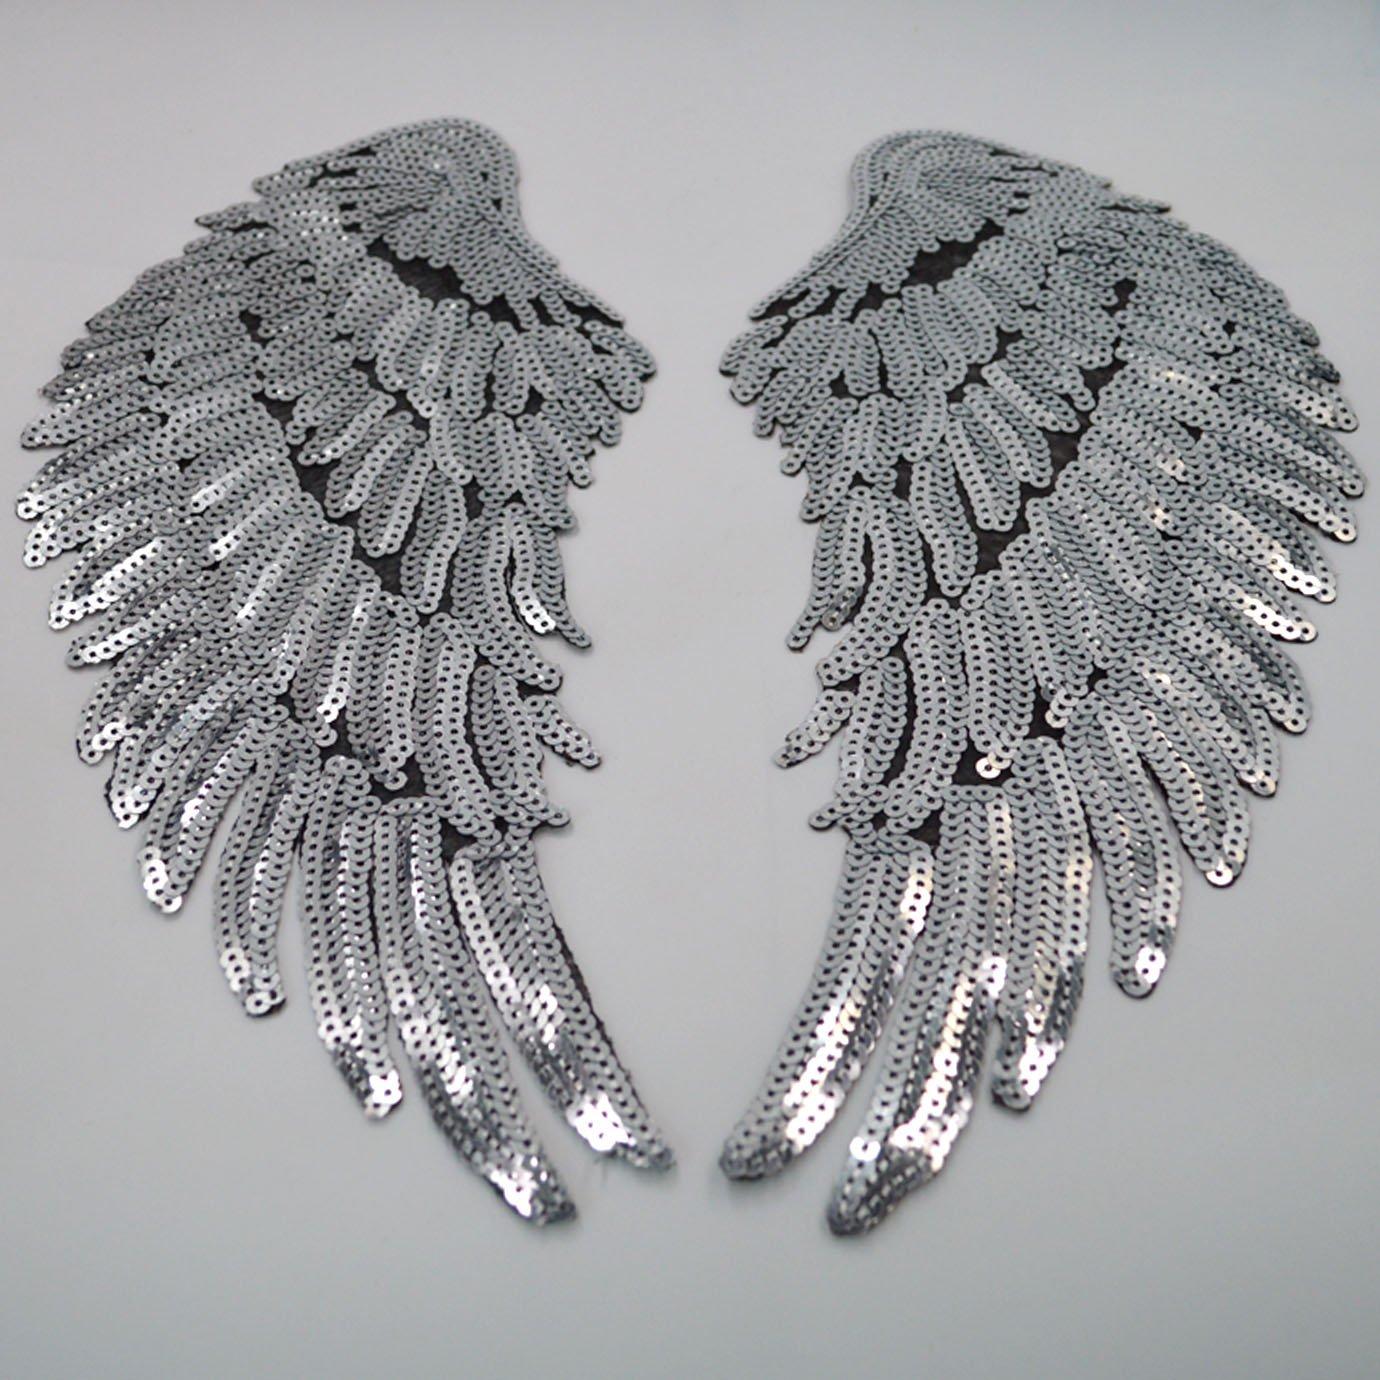 plateado decoraci/ón dorado talla /única Parche para planchar de alas bordadas con lentejuelas para ropa 1 par